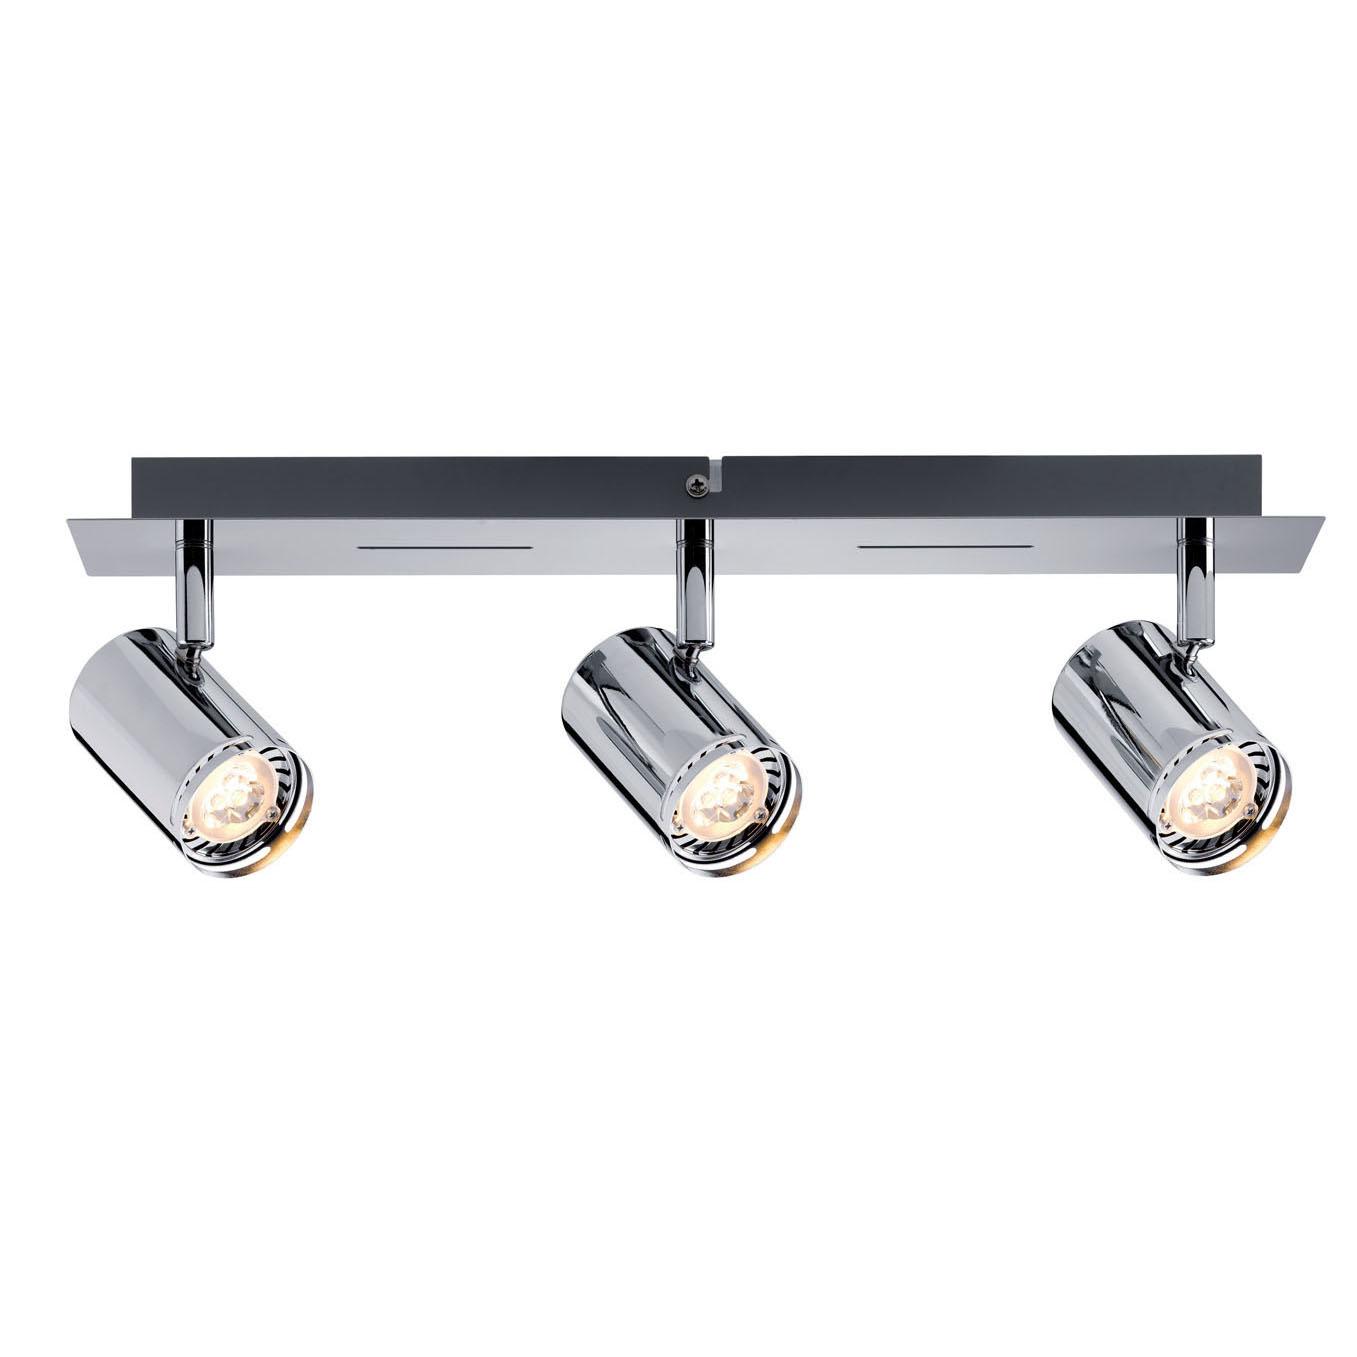 led ceiling spot lights photo - 2